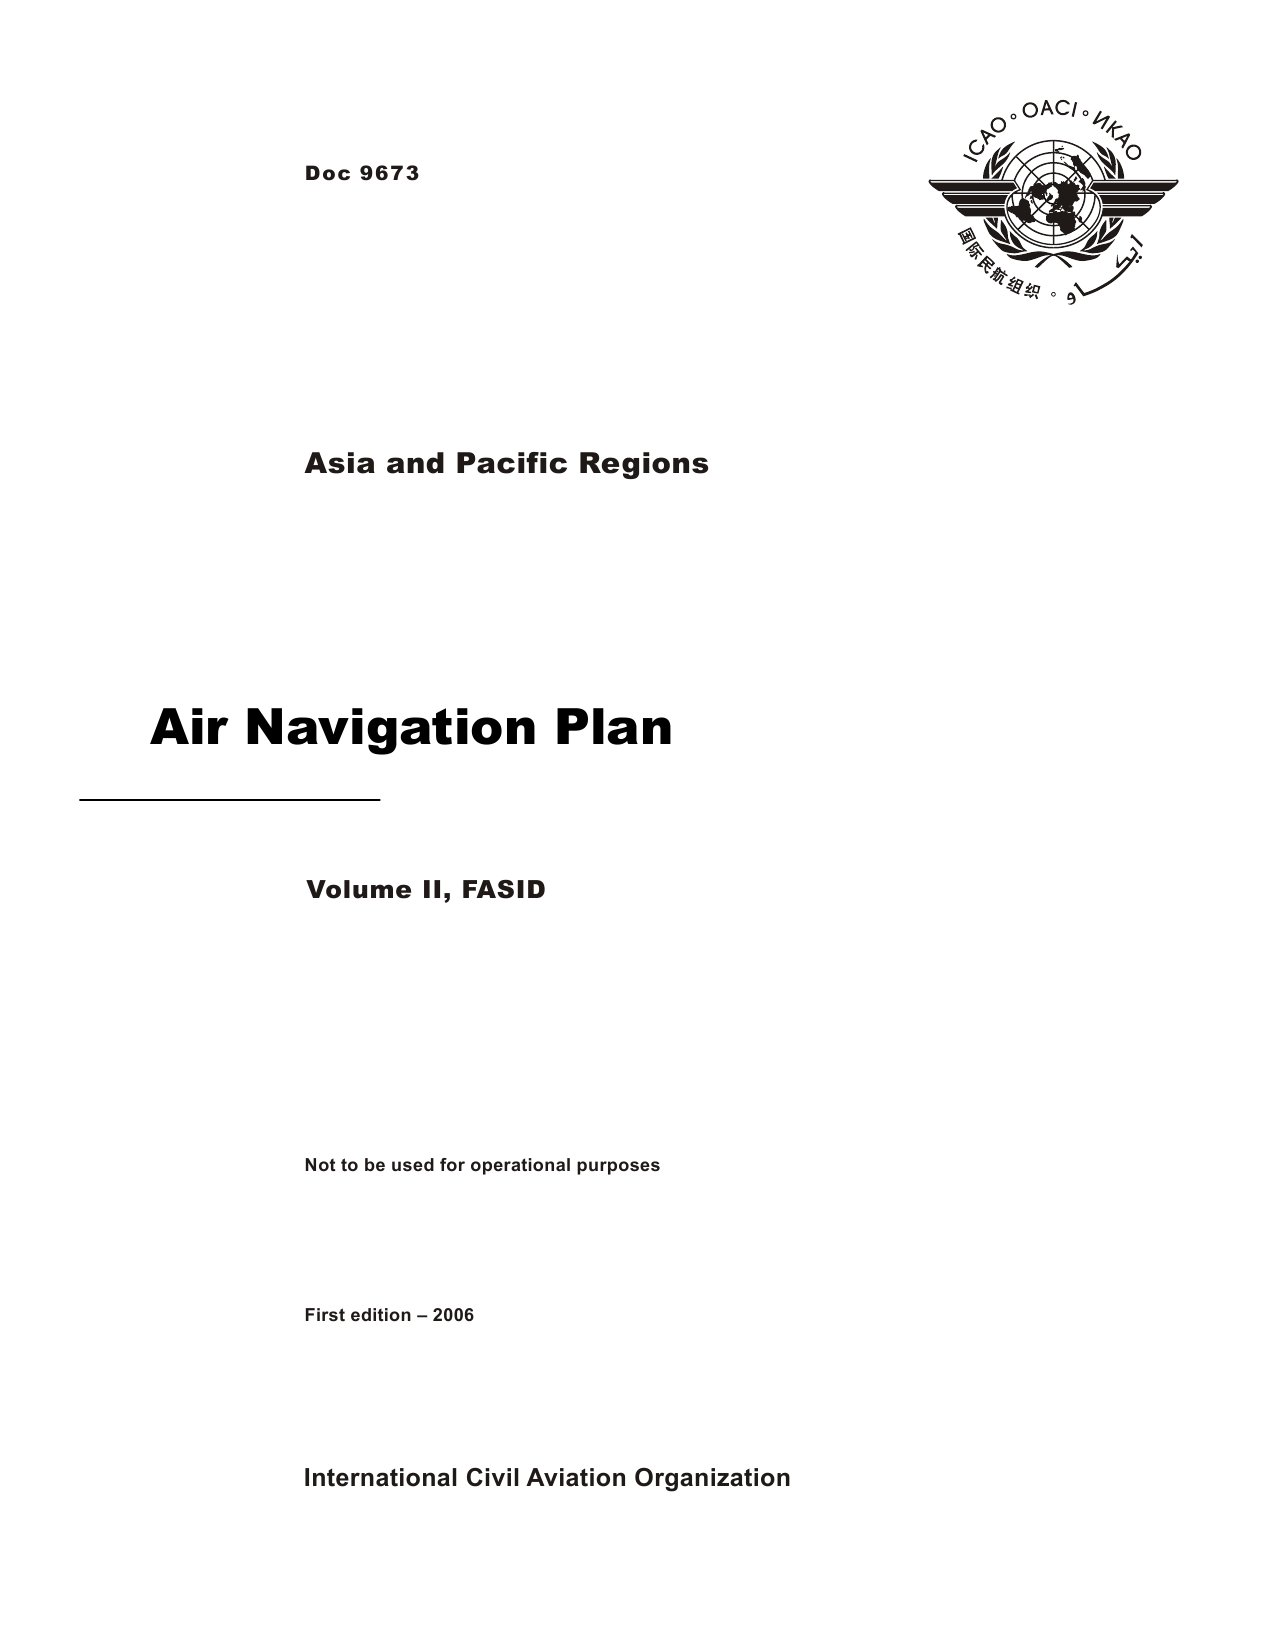 ICAO Doc 9673 Аэронавигационный план. Регион Азии и Тихоокеанский регион. Том II. FASID.